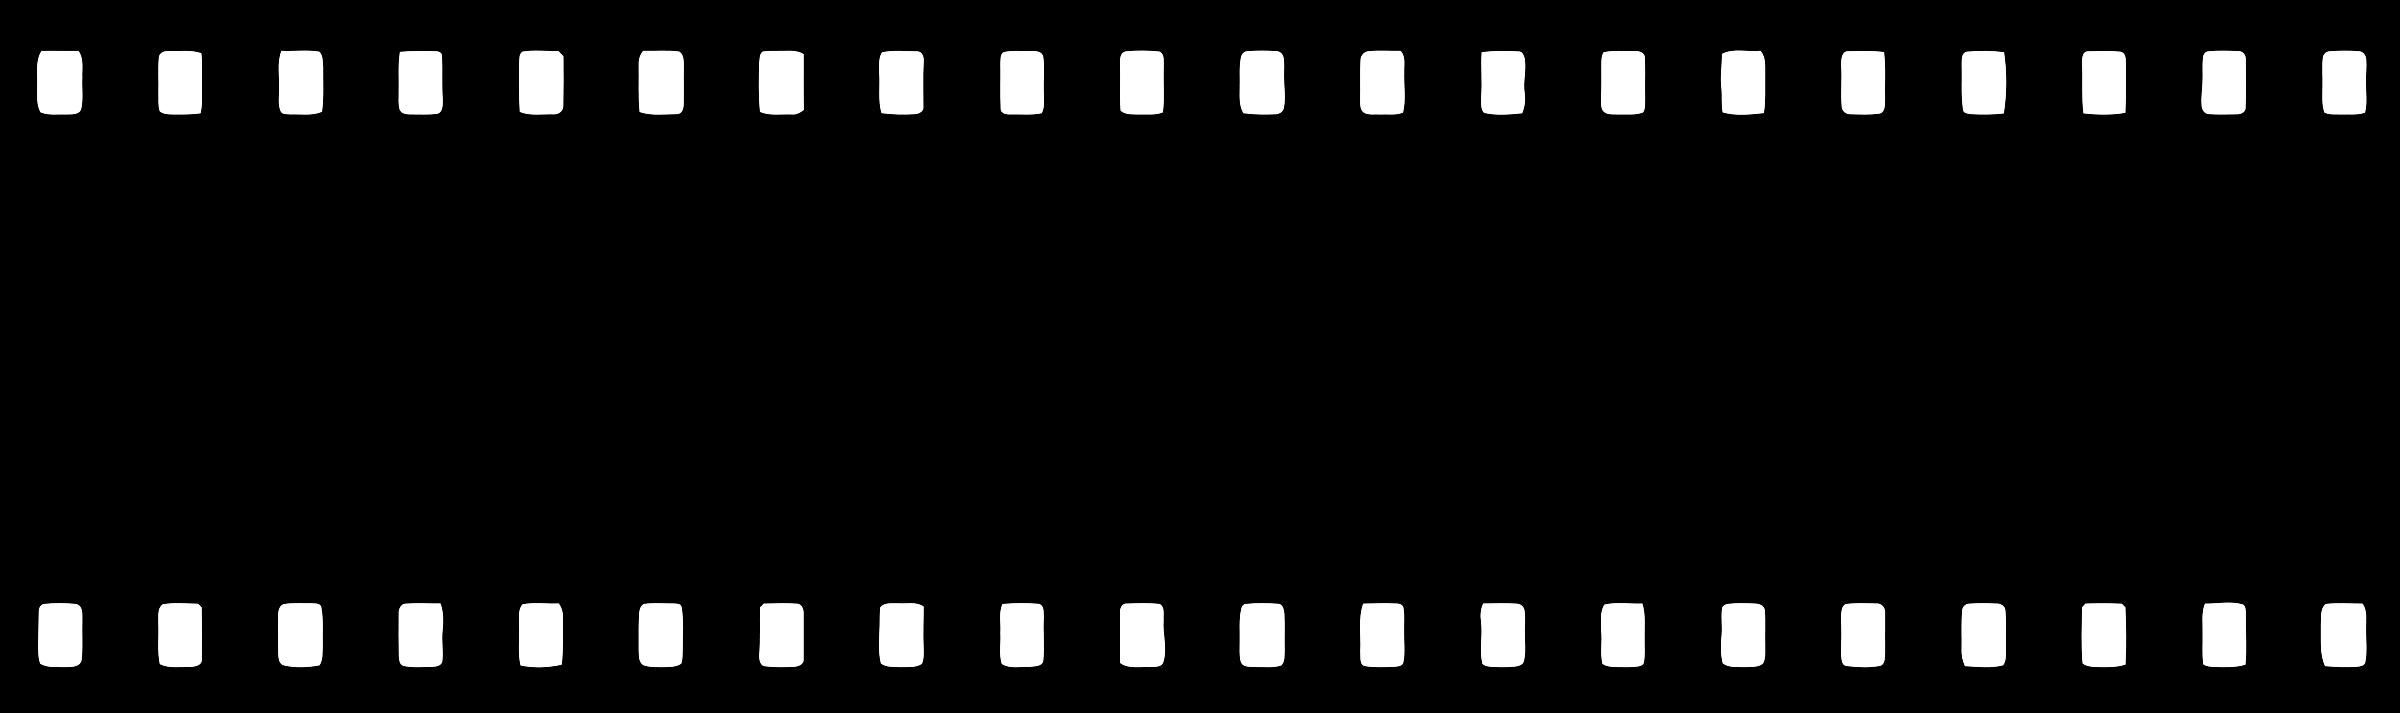 Video Film Clipart